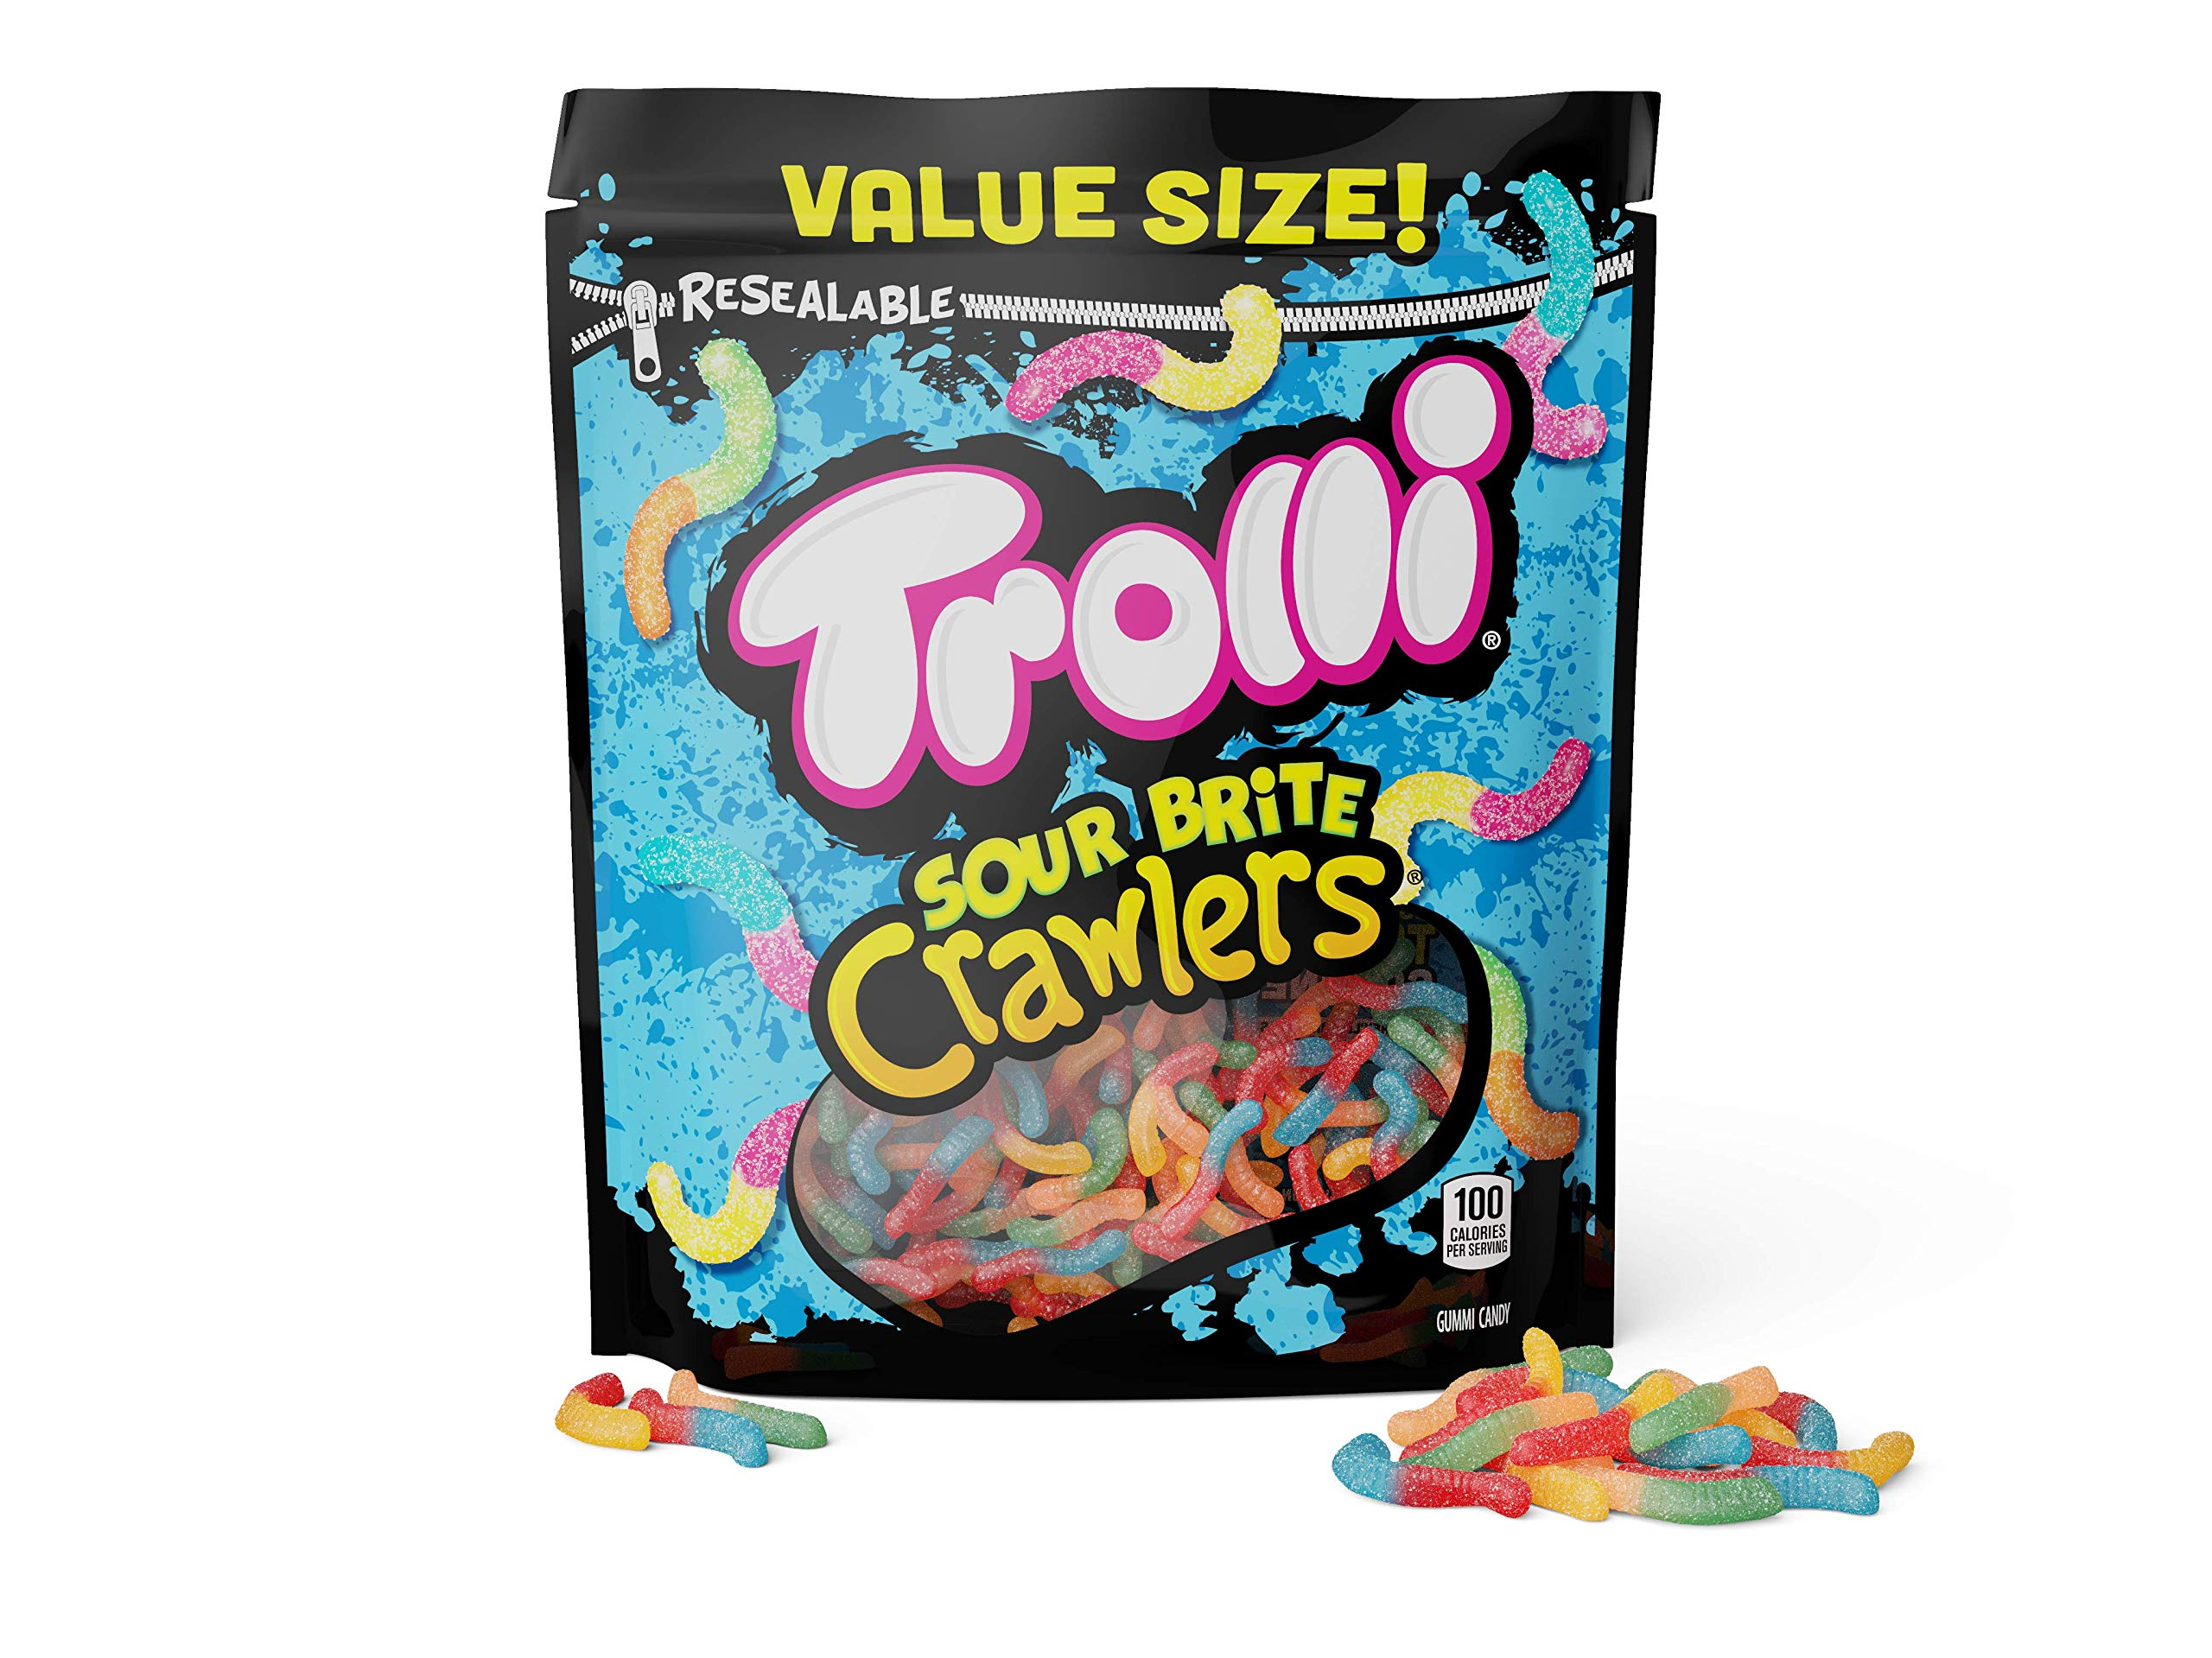 Trolli Sour Brite Crawlers Gummy Worms, 28 Ounce Bag Sour Gummy Worms by Trolli (Image #3)